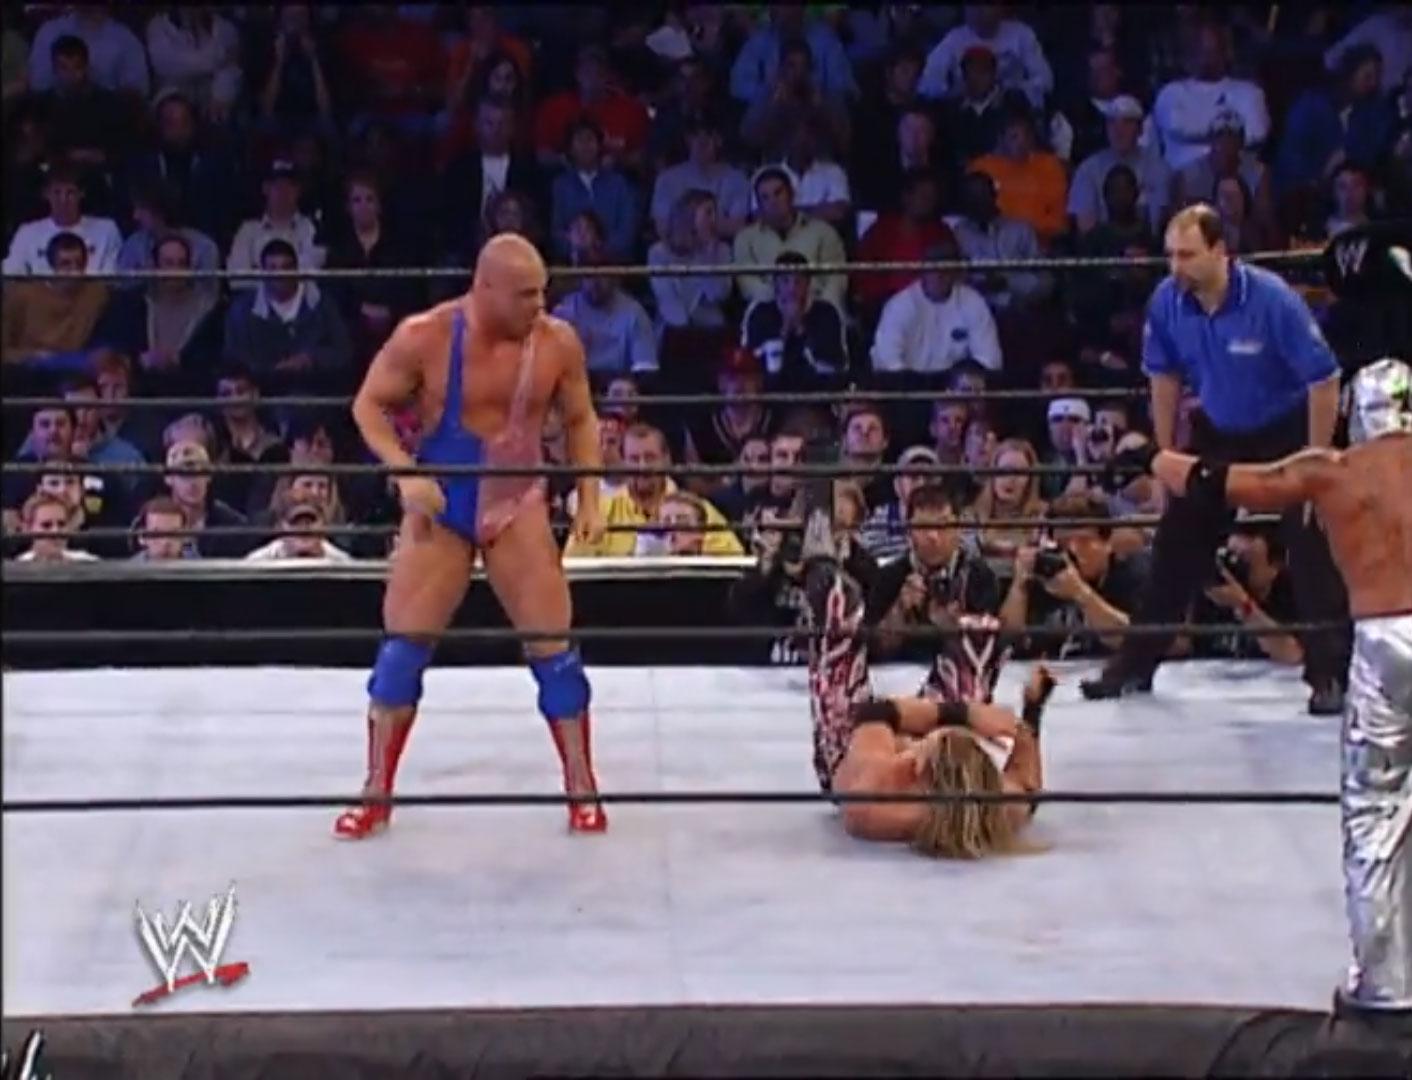 Chris Benoit, Kurt Angle vs. Edge, Rey Mysterio WWE Tag Team Championship WWE No Mercy '02, Oct 20th 2002